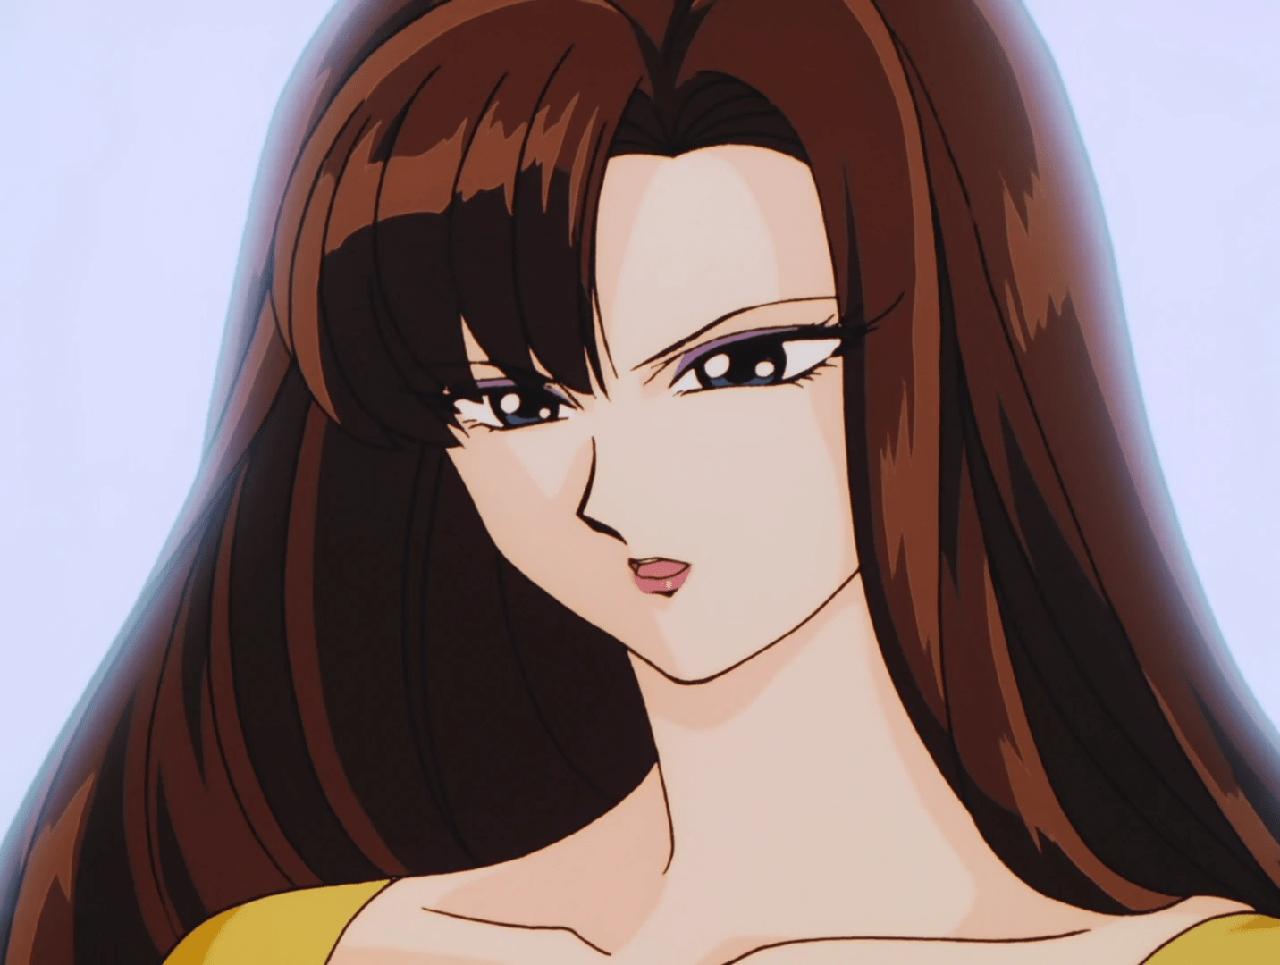 hinako ranma anime ranking poder